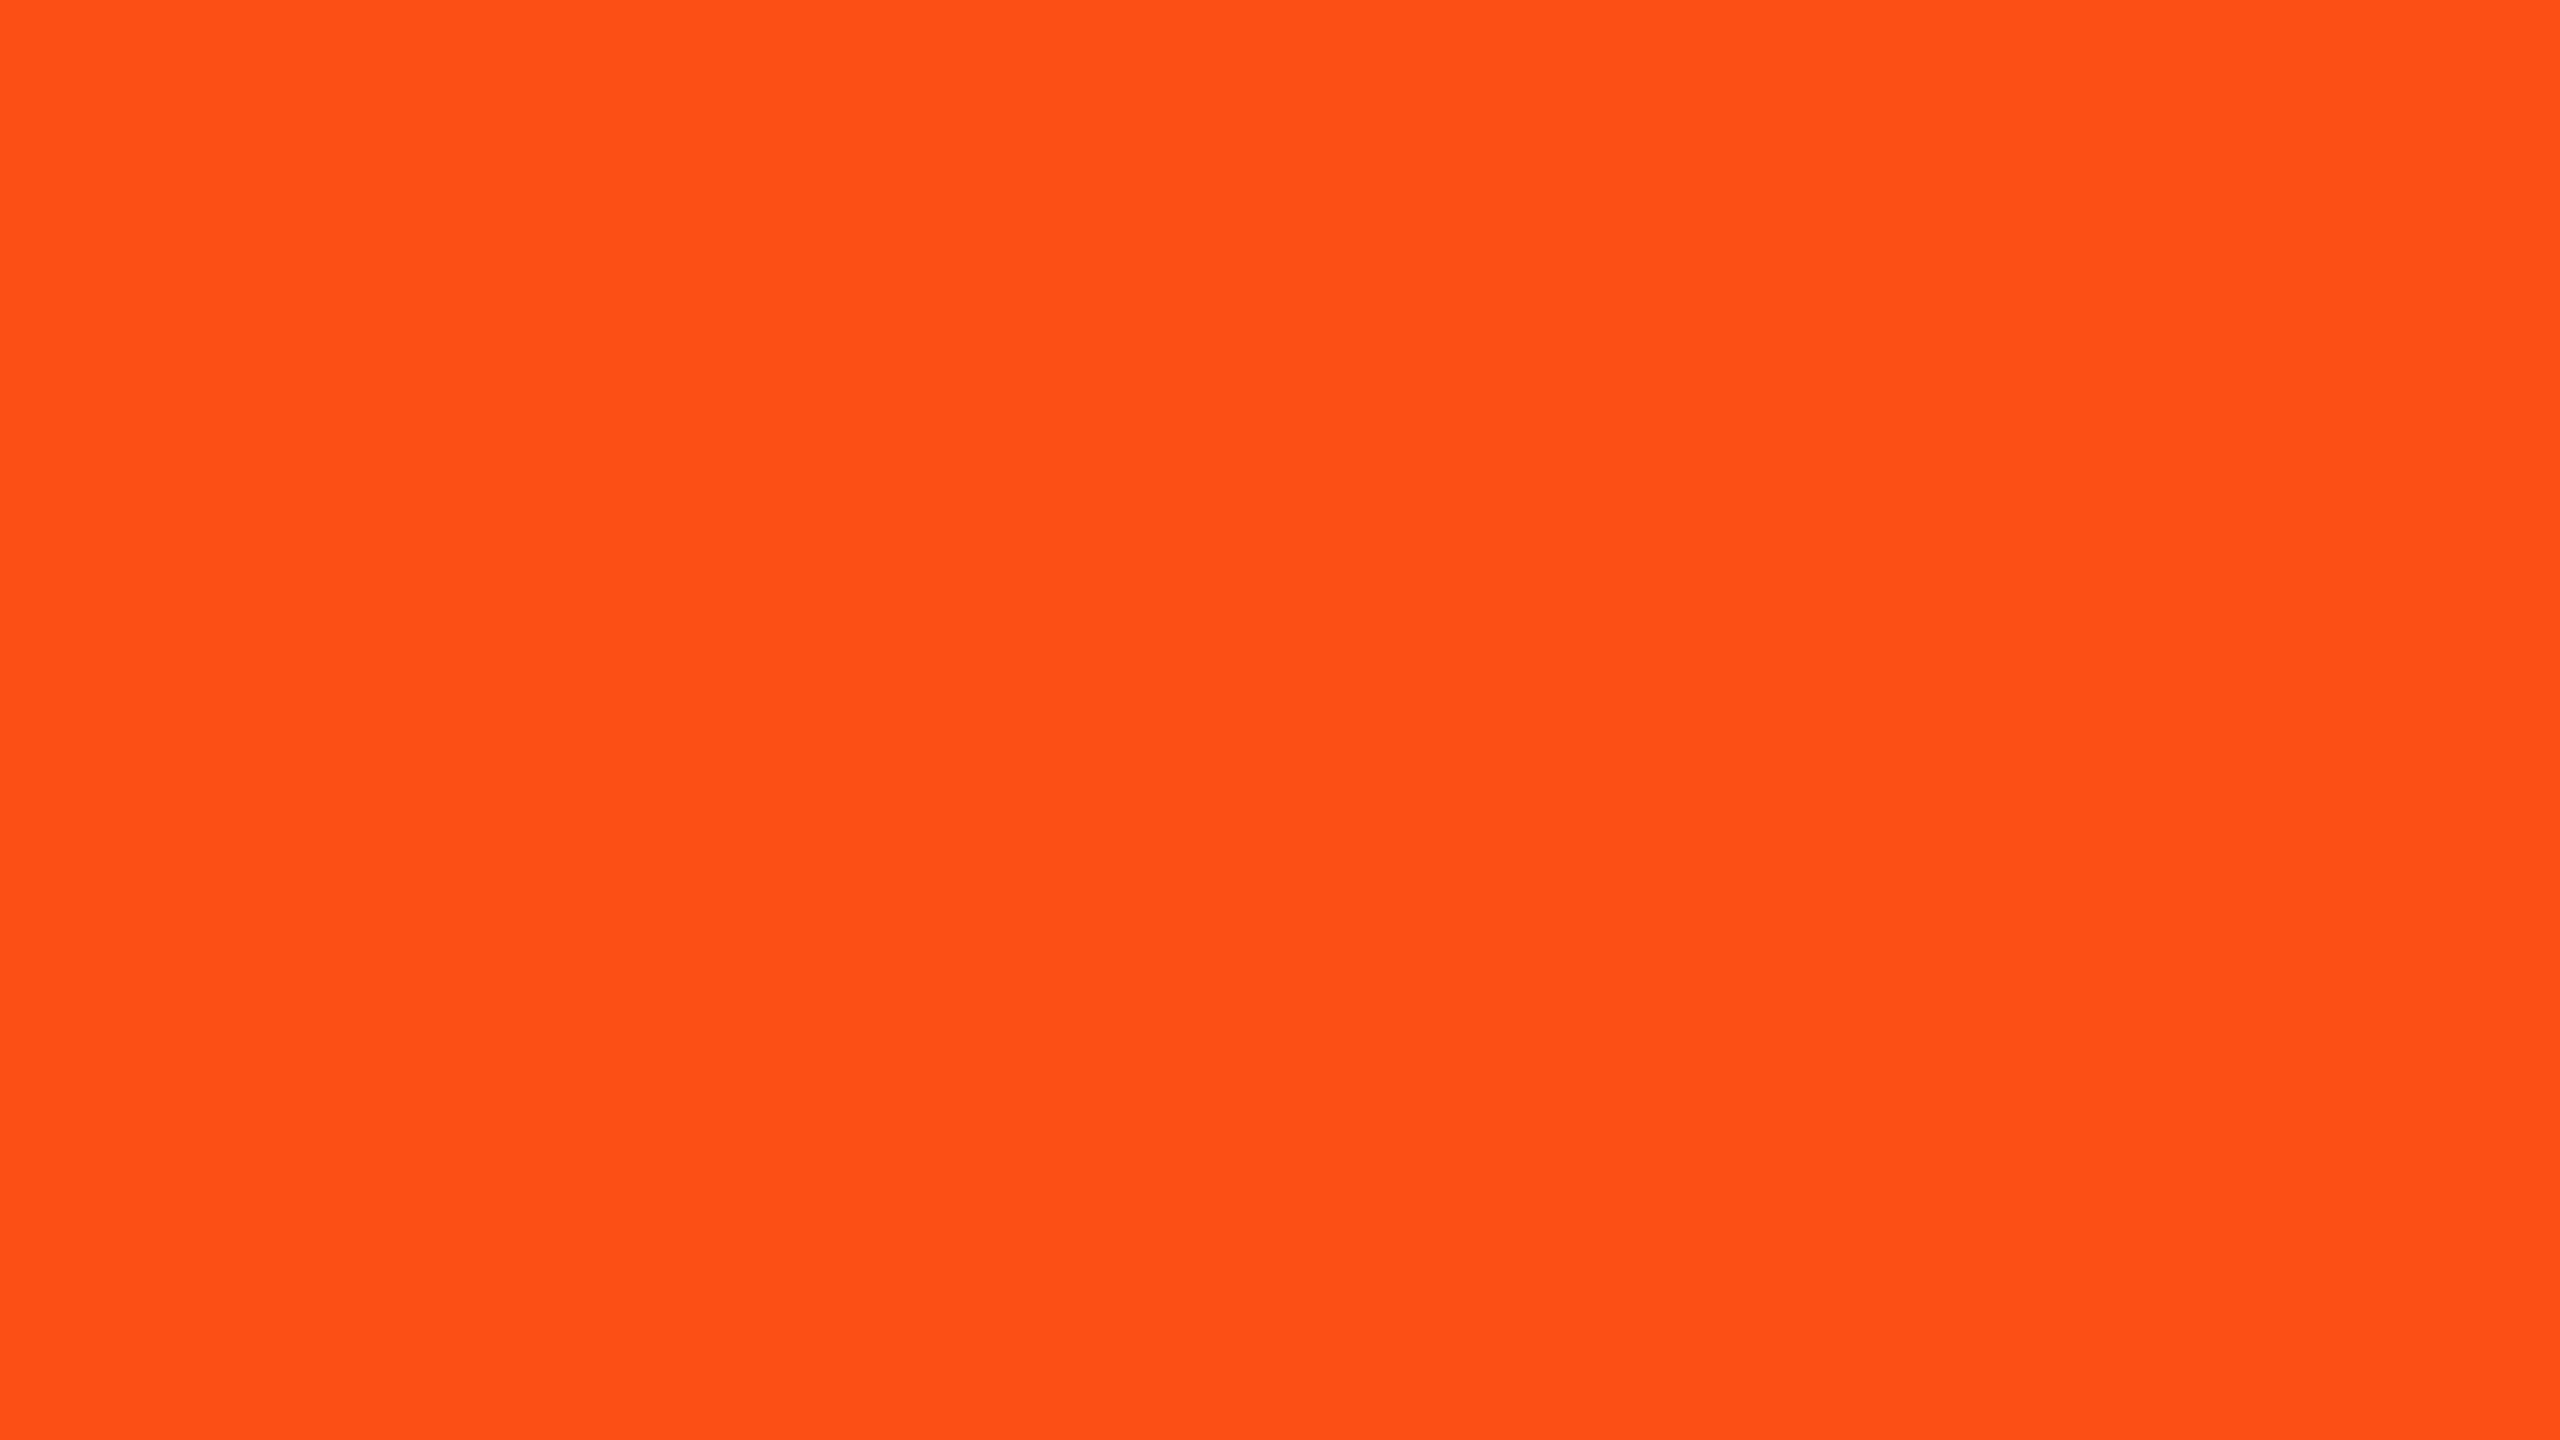 Solid Orange Wallpaper 47197